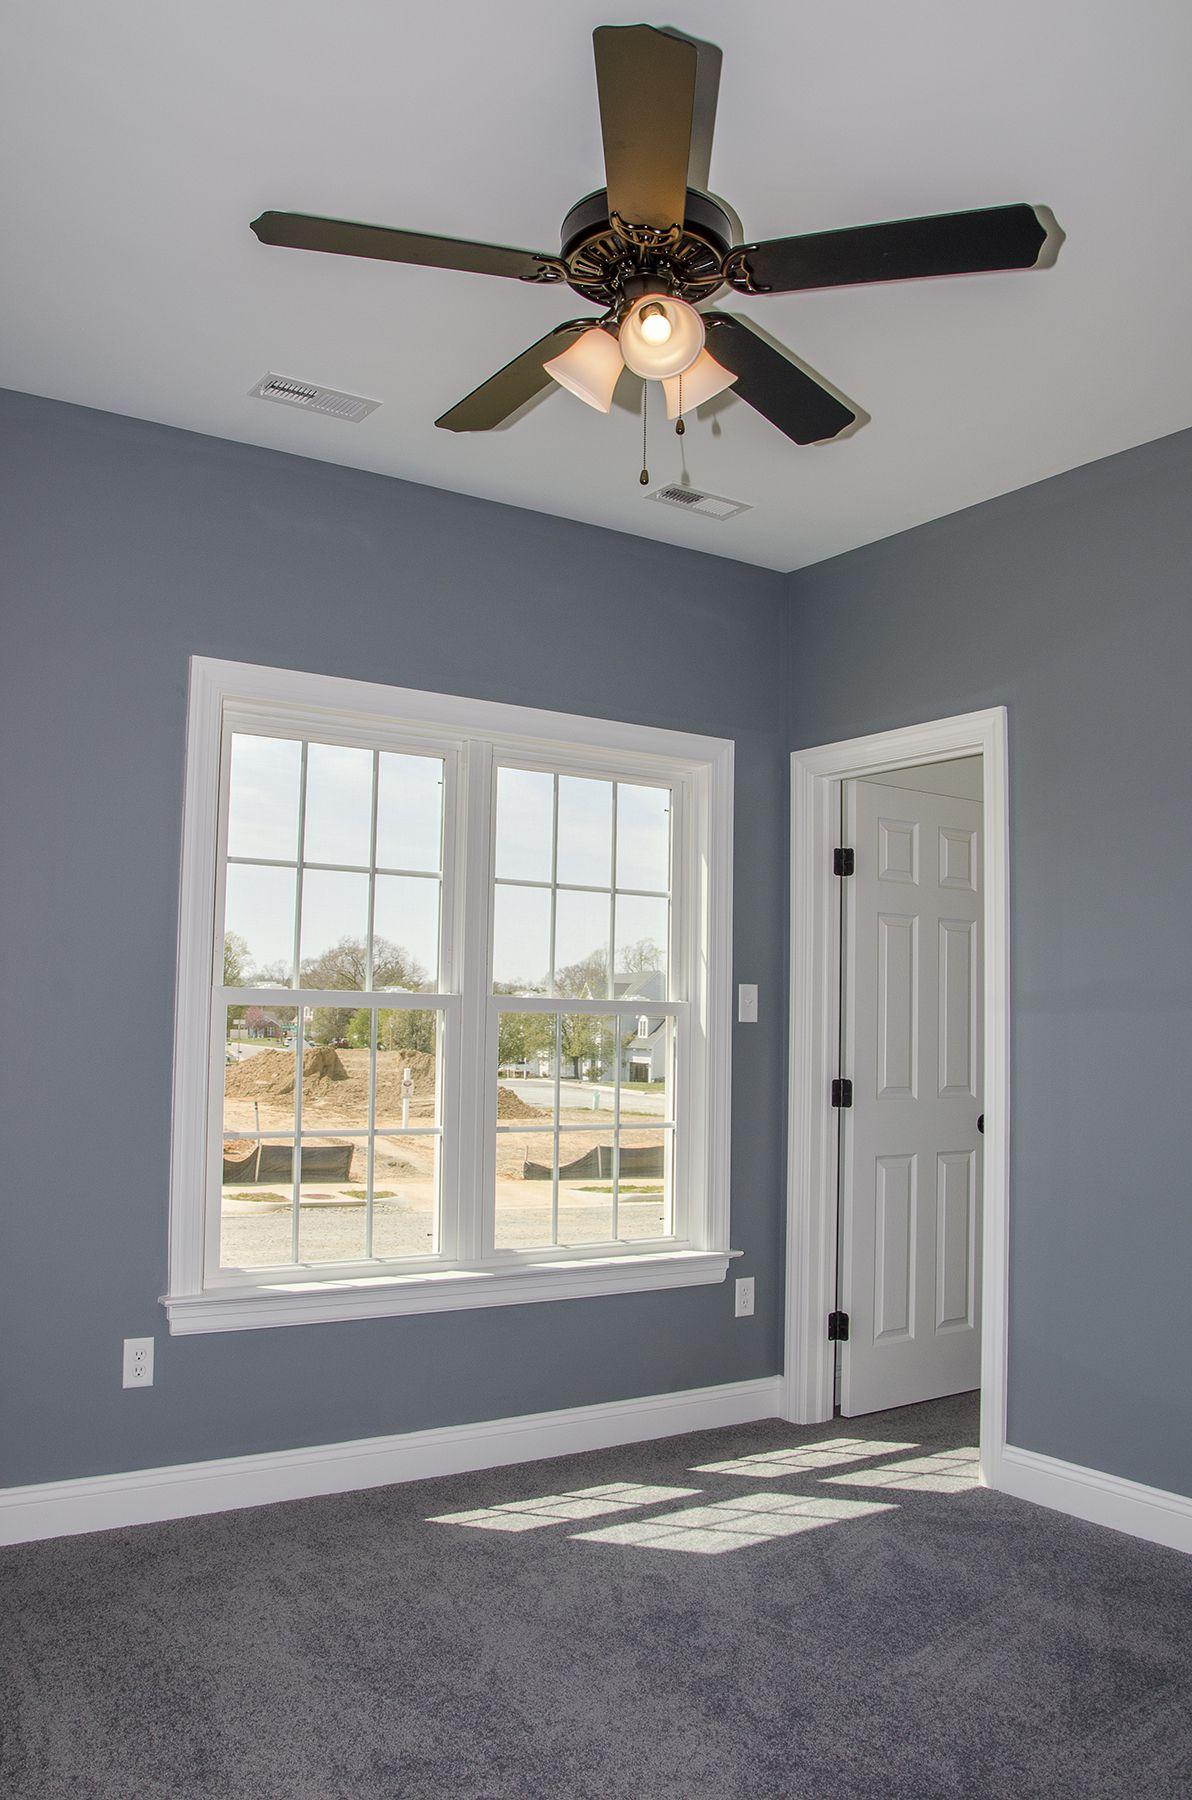 Kids Bedroom Or Guest Bedroom With Gray Blue Walls And Carpet Bedroom Designideas Balducci Bui Blue Walls Living Room Blue Carpet Bedroom Blue Bedroom Walls